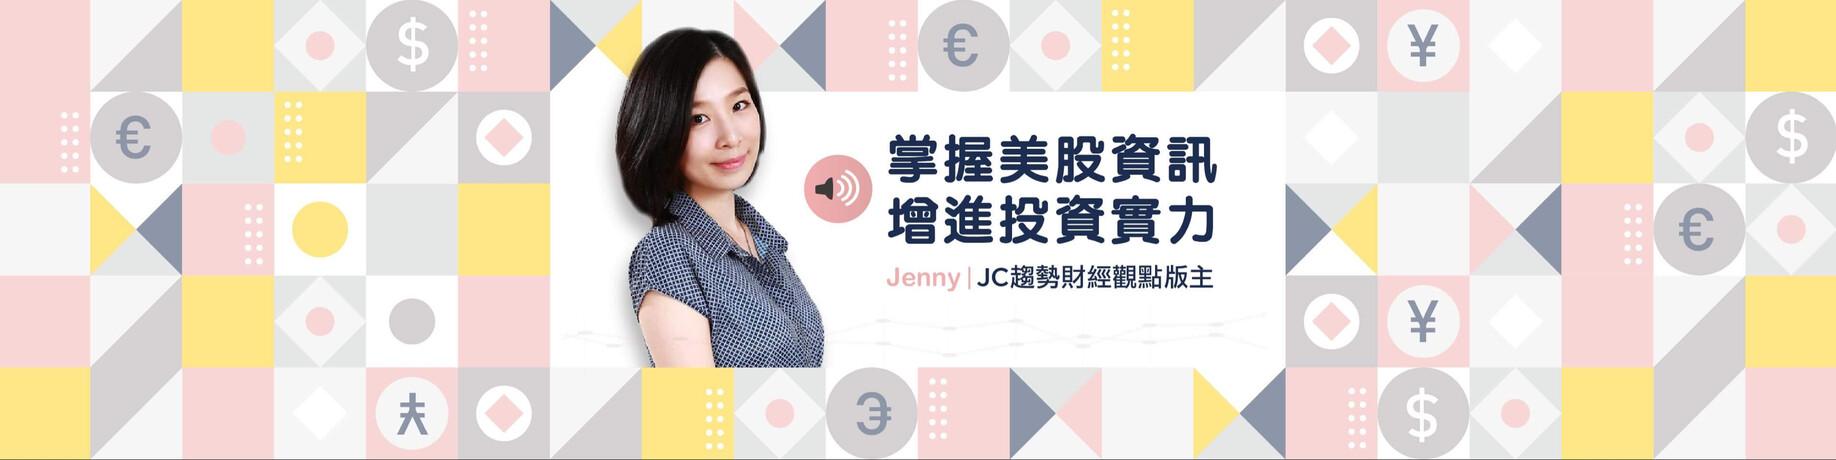 Jenny 的美股投資課-高速成長與穩健收息